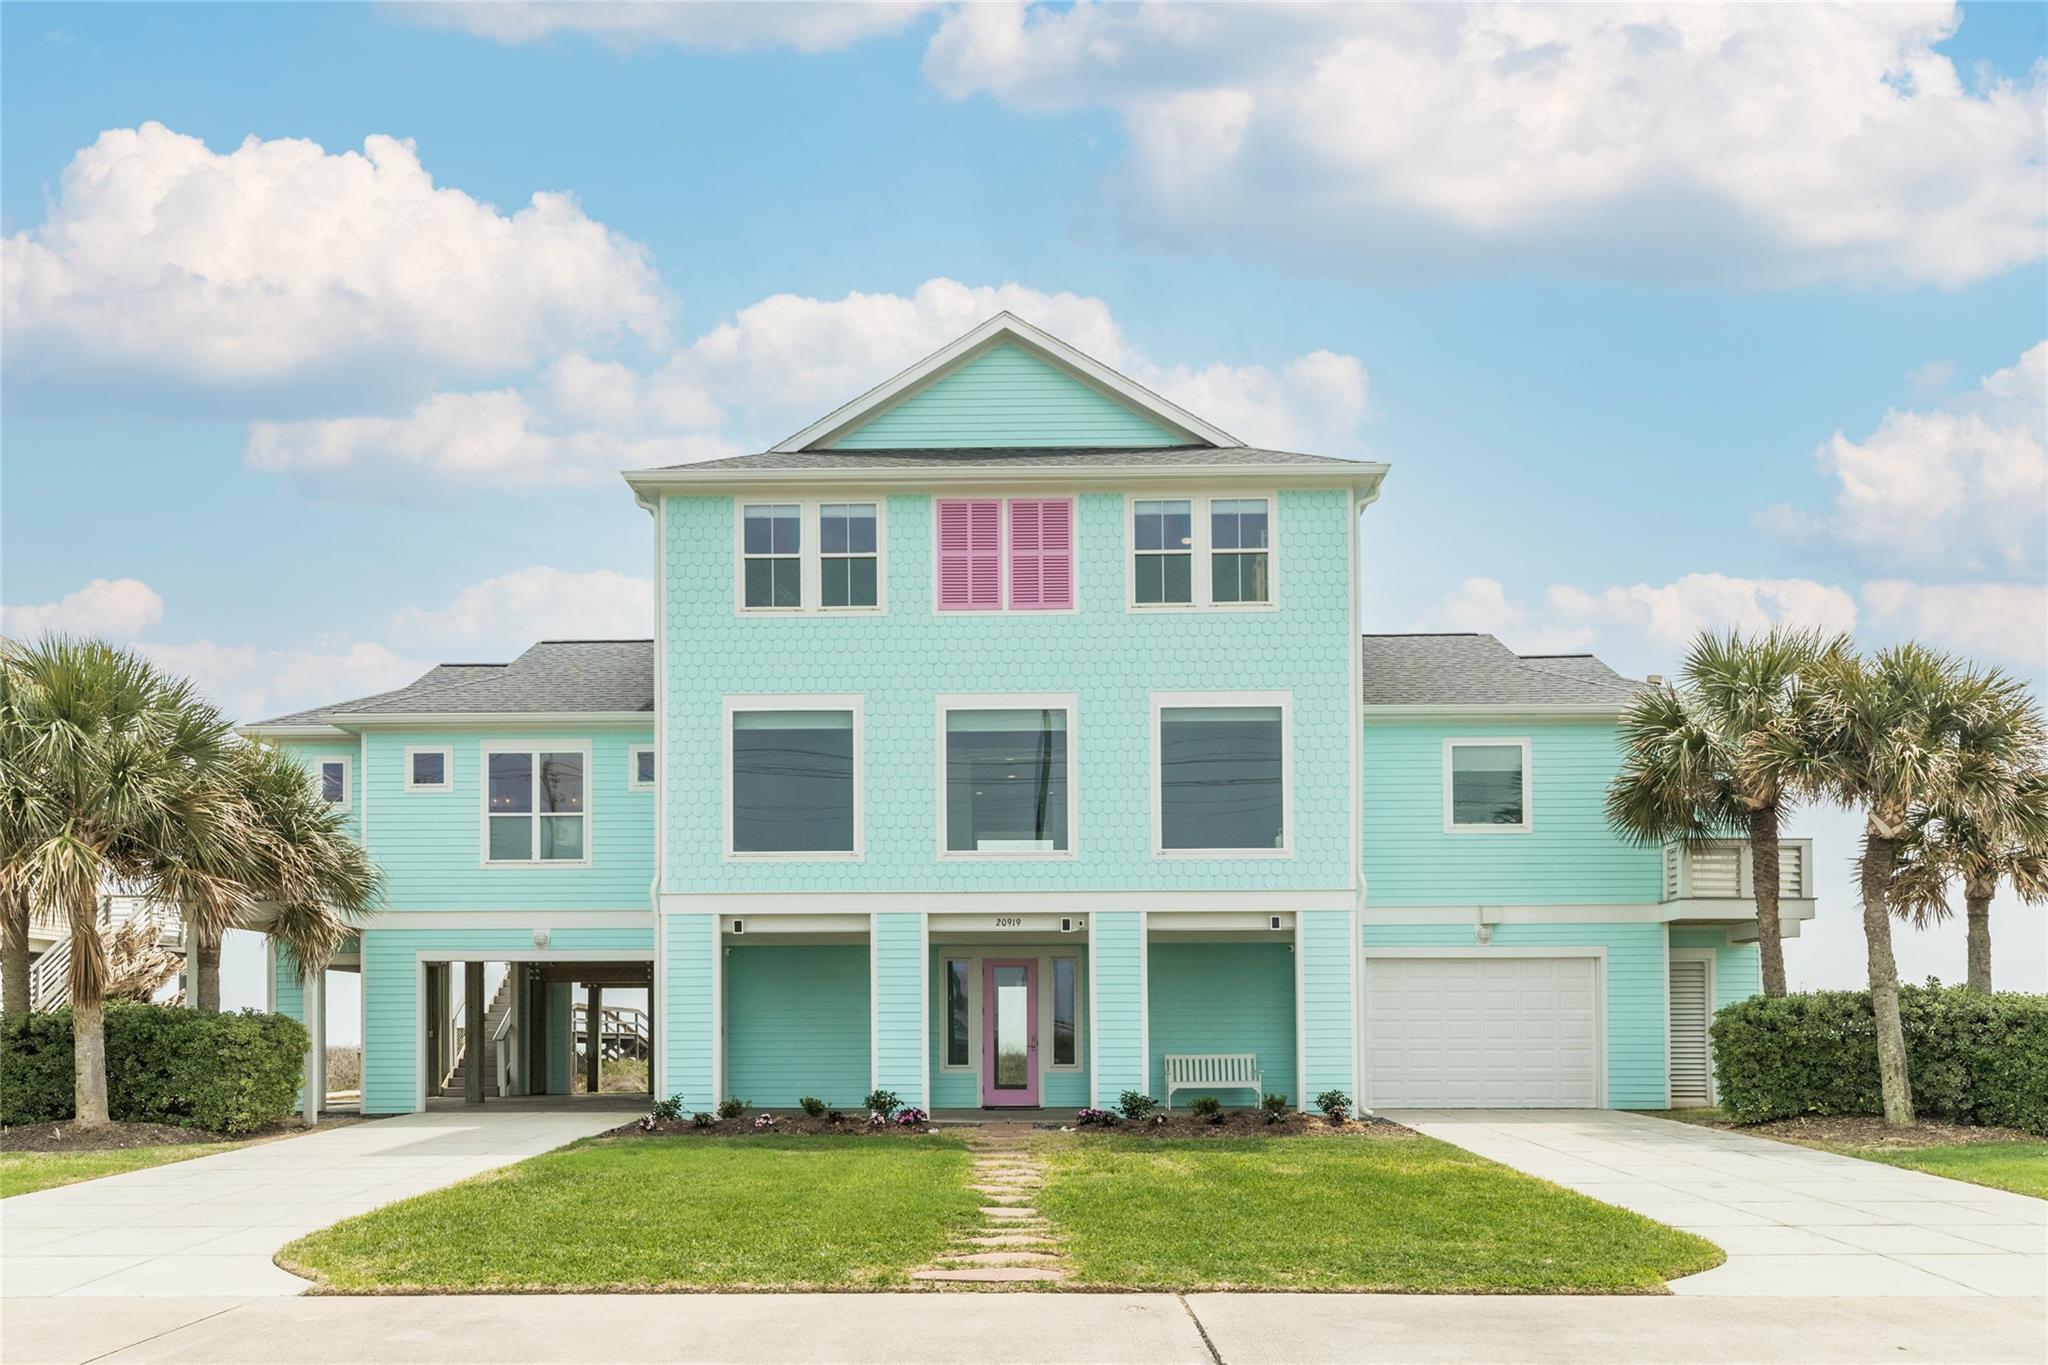 20919 W Sandhill Drive Property Photo - Galveston, TX real estate listing